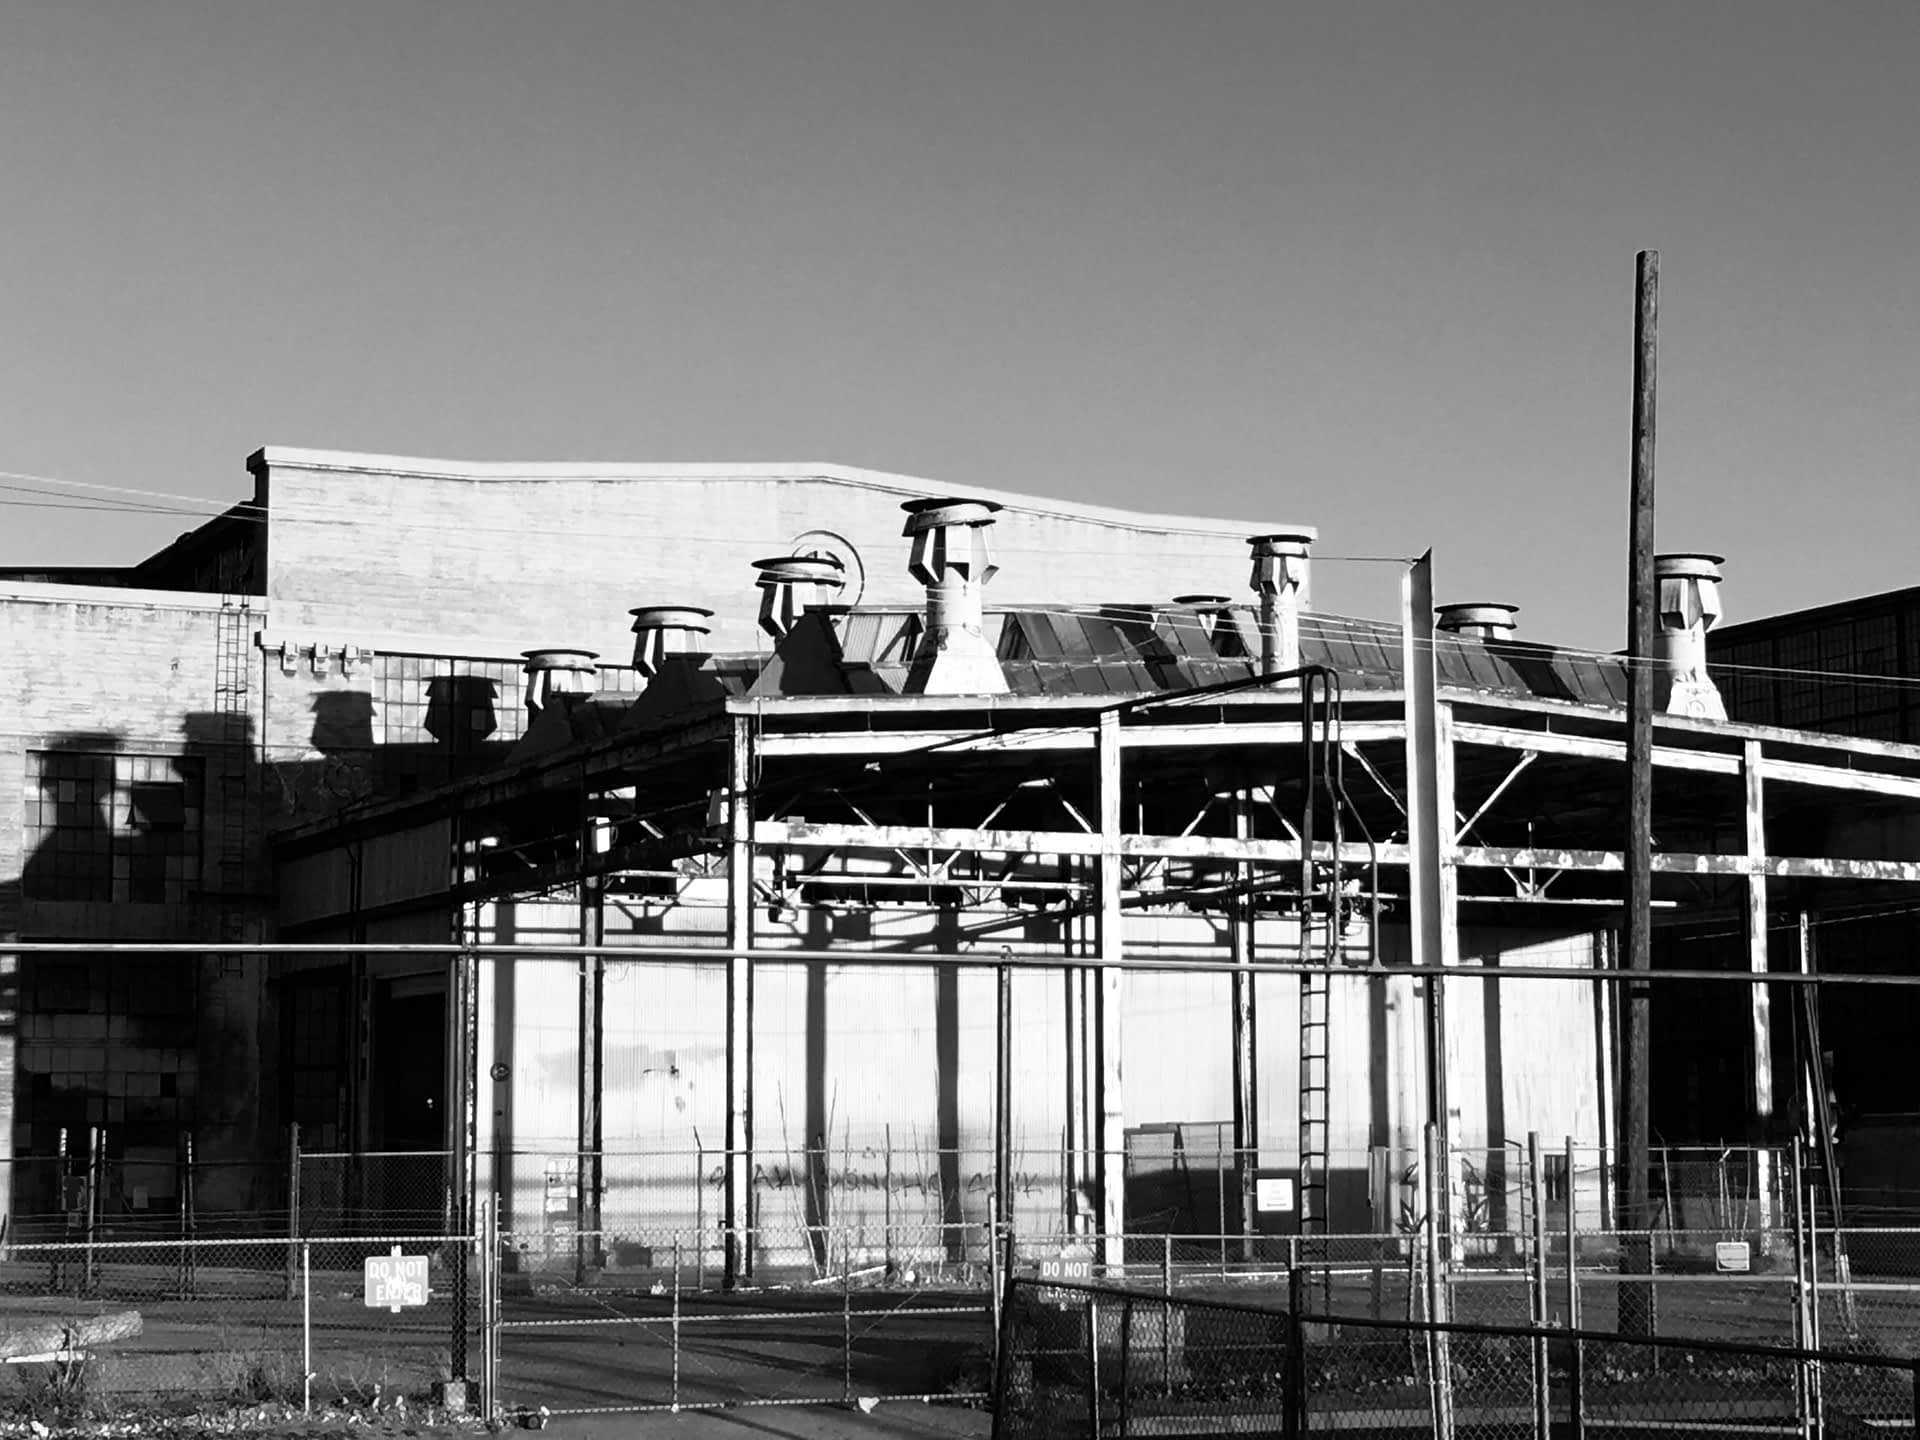 Rail Yards B/W Paint Shop #004